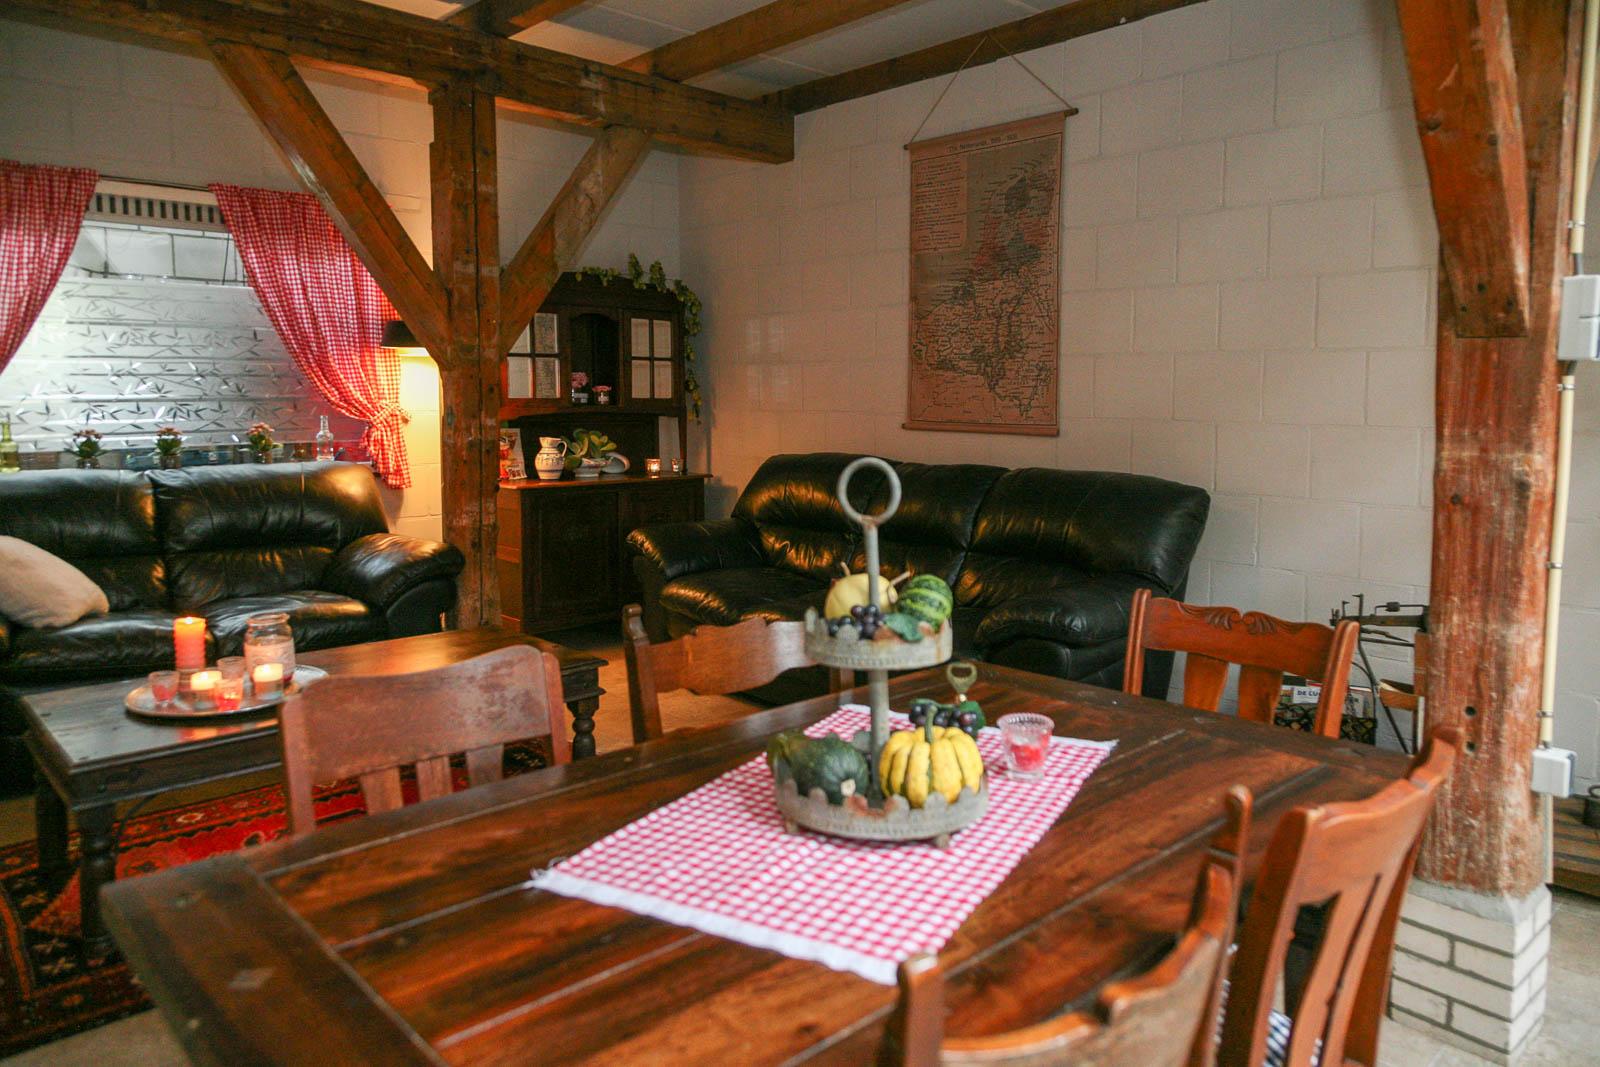 Hillegondahoeve-De Oude Stal-1419